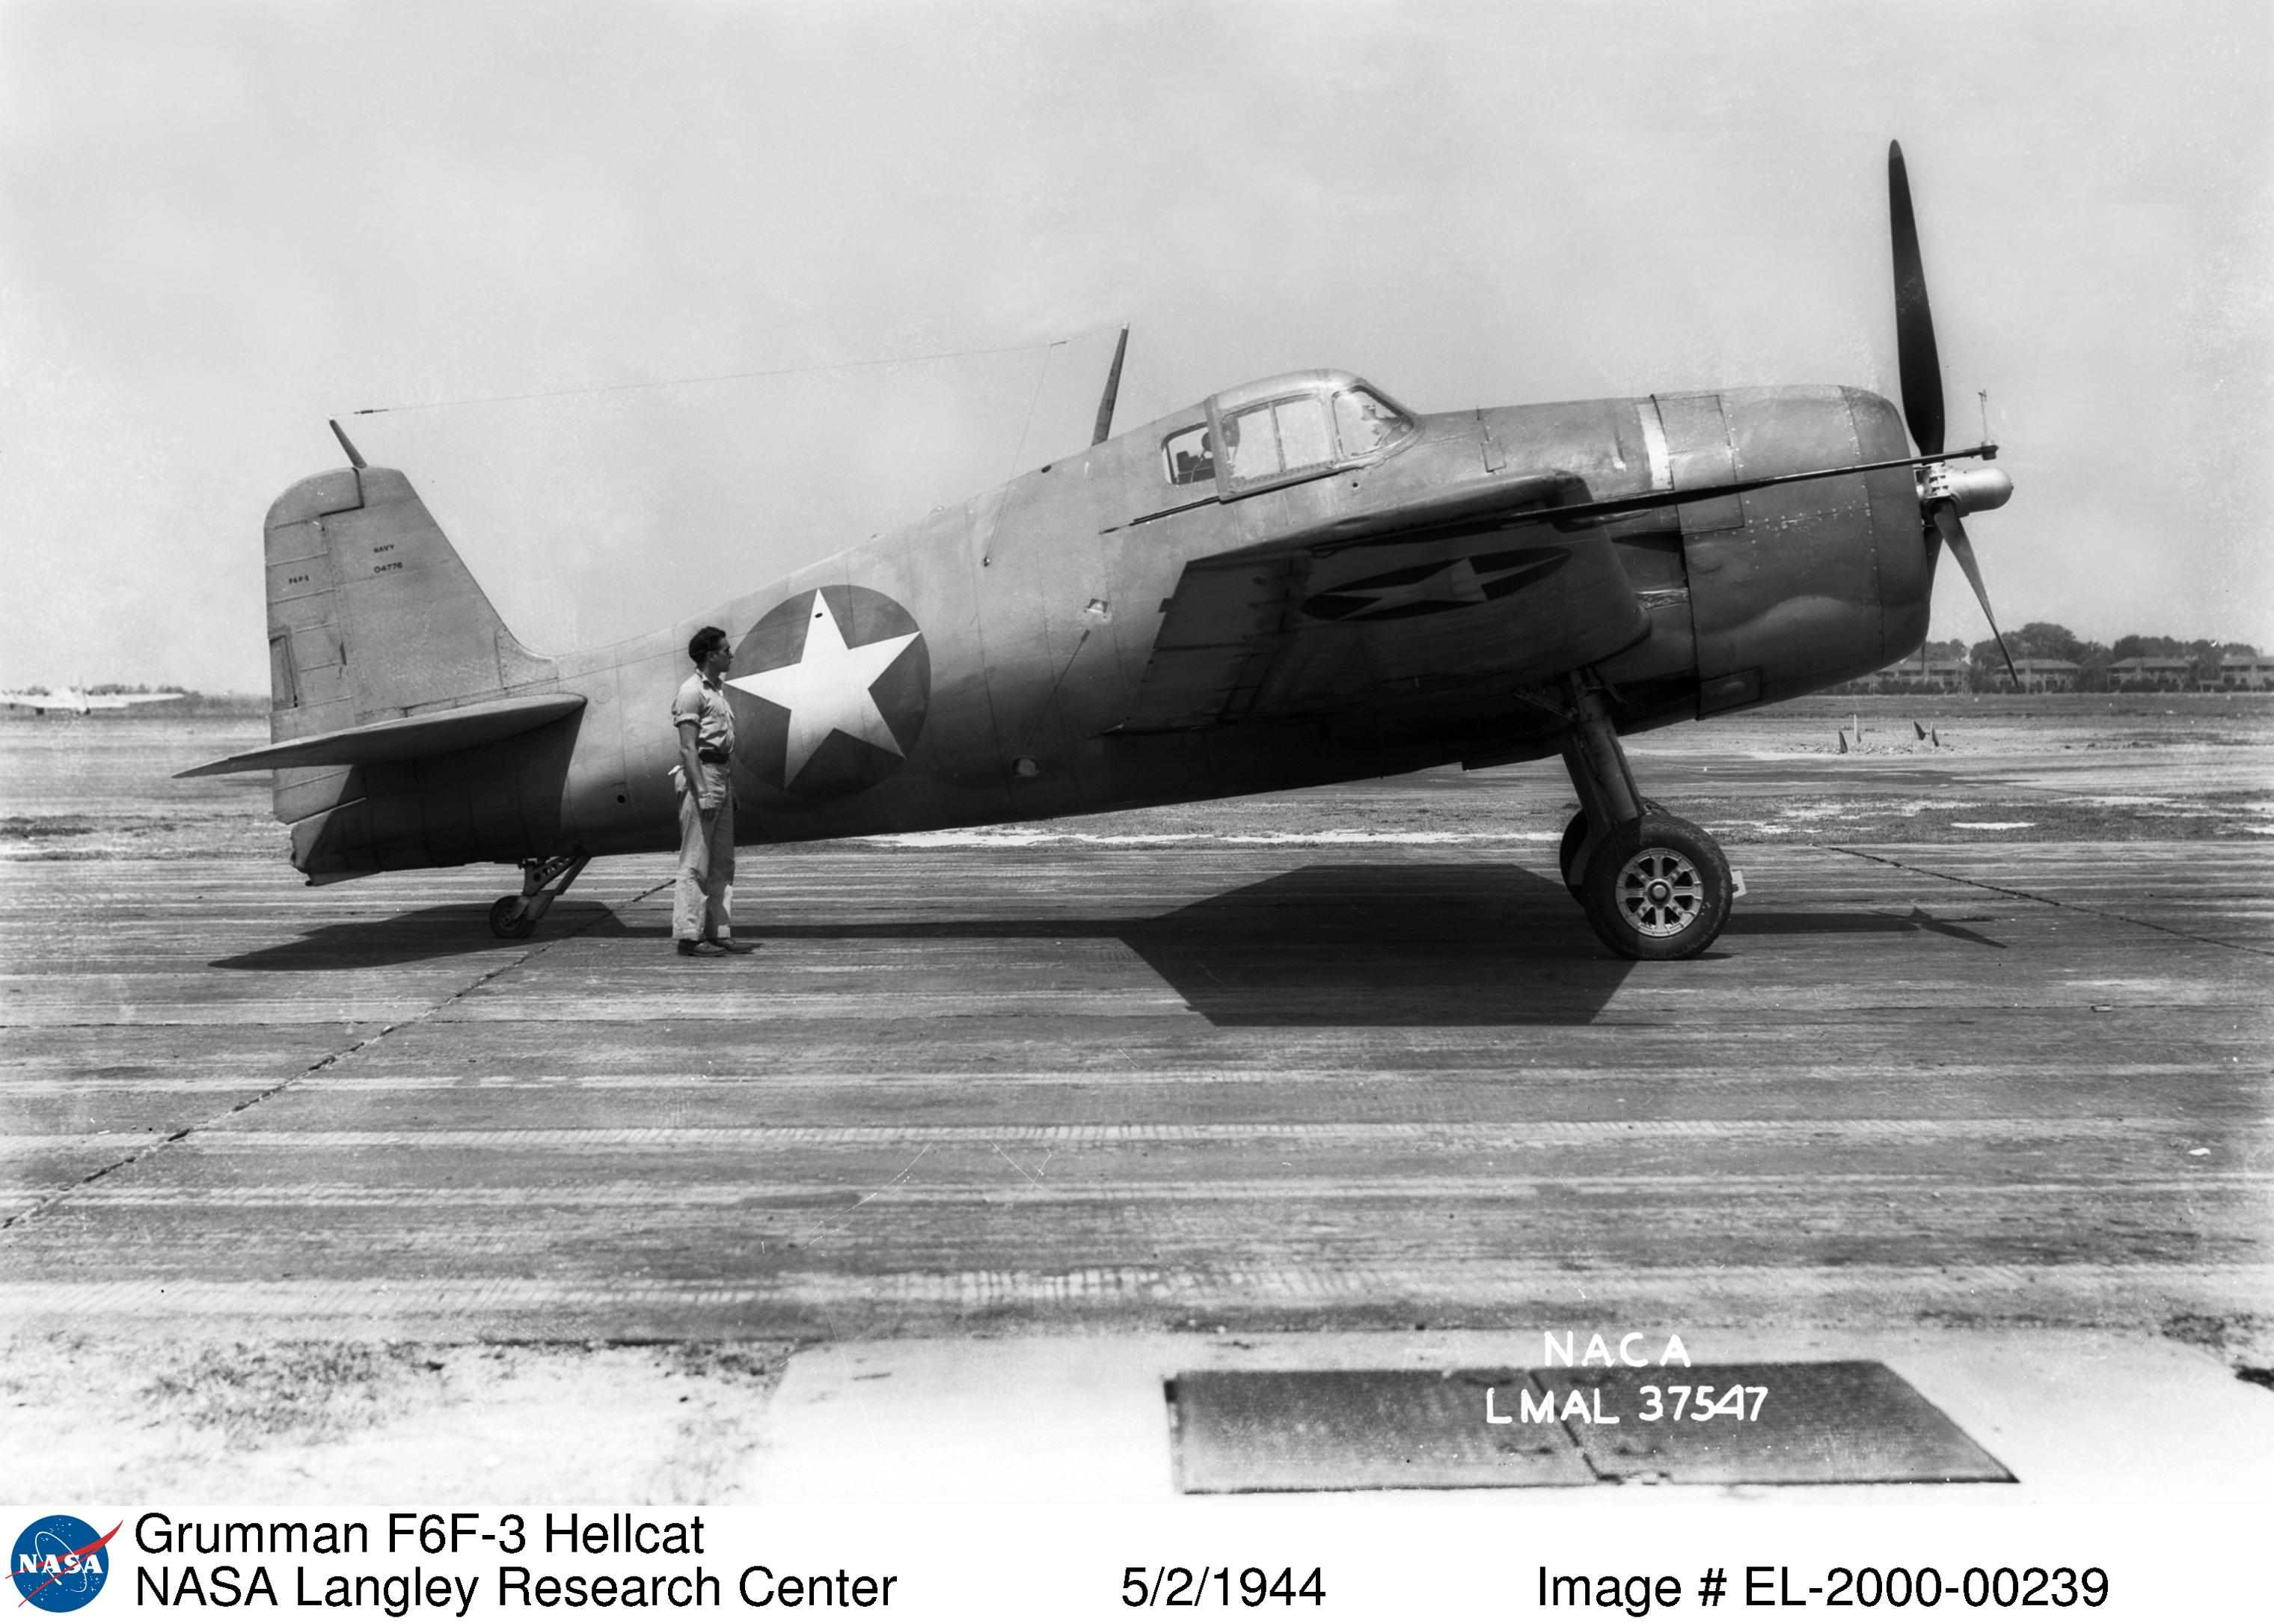 Grumman F6F 3 Hellcat NASA Langley Research Center 2nd May 1944 01